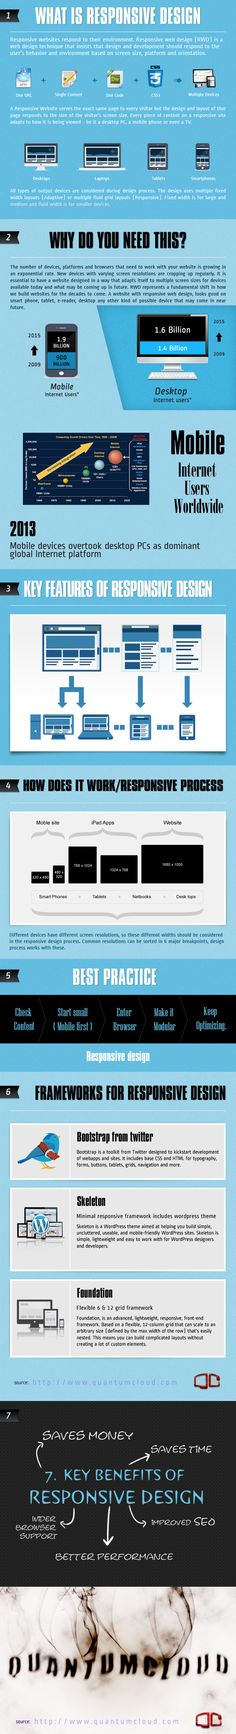 What is Responsive Design? #infografia #infographic #design